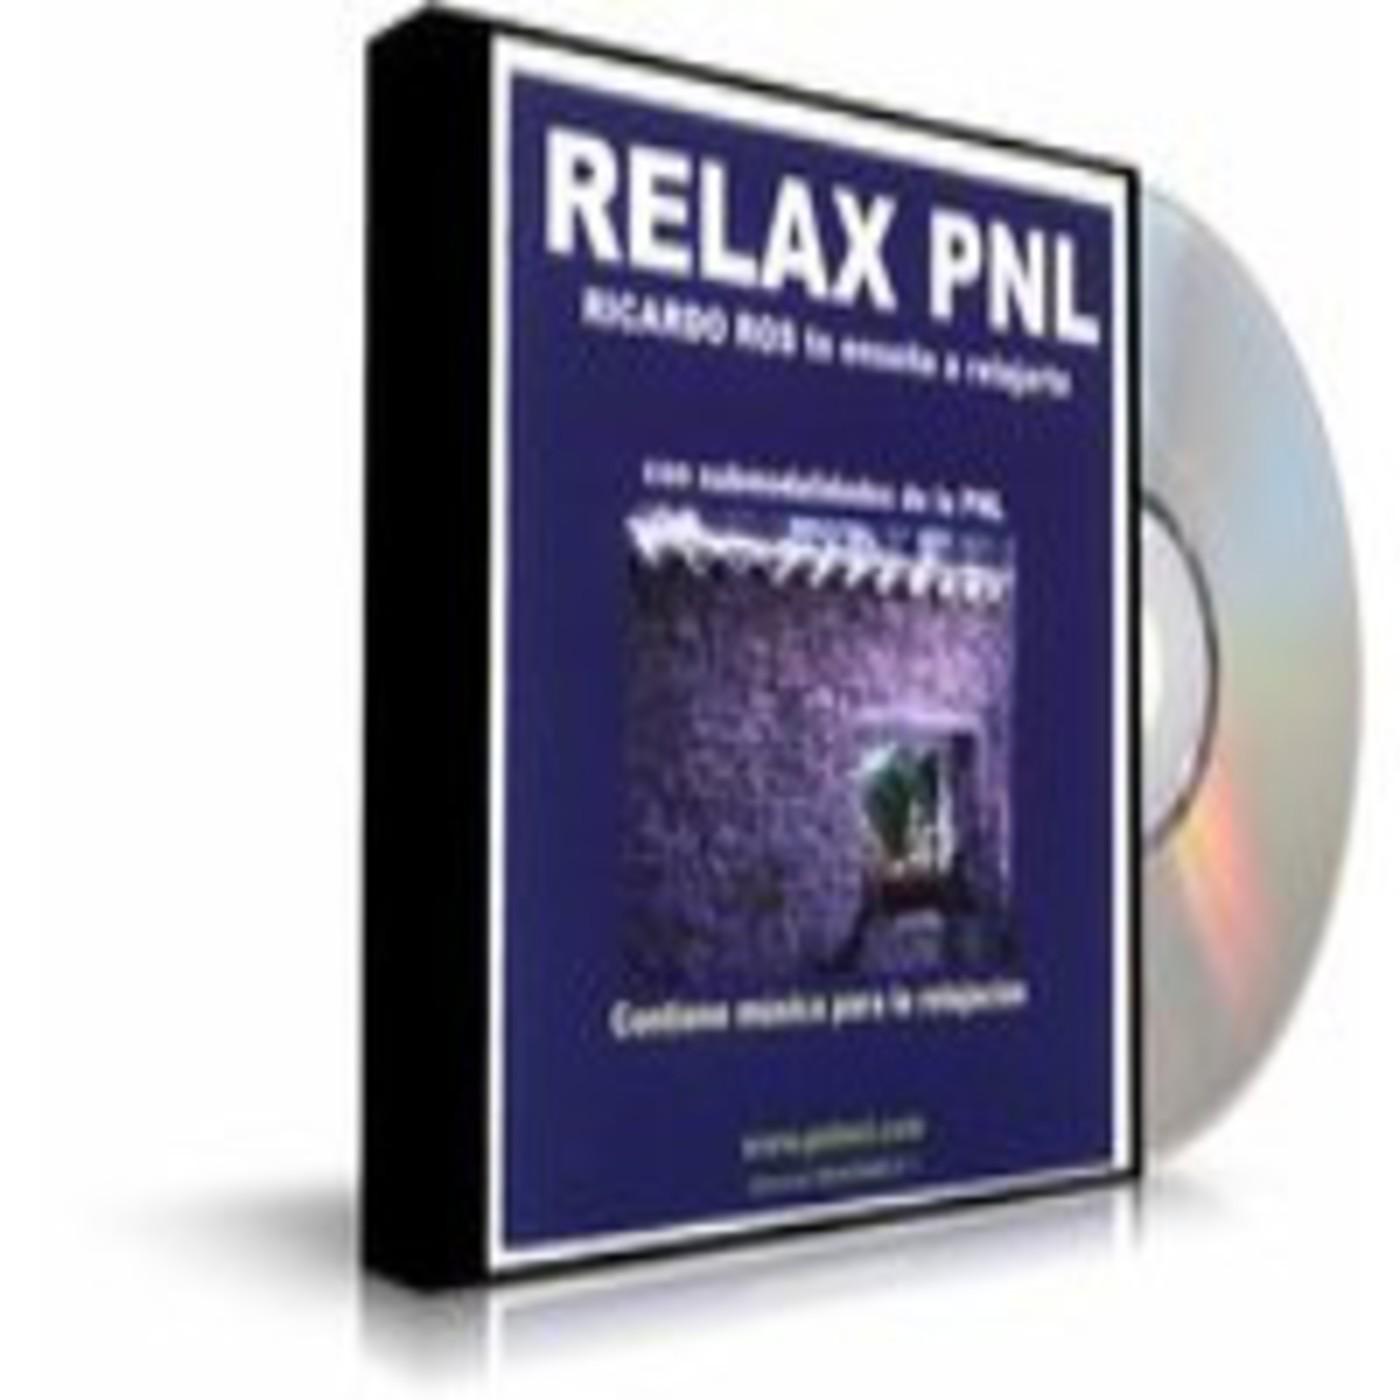 Ricardo Ros - RELAX PNL | Relajacion con Programacion Neurolinguistica